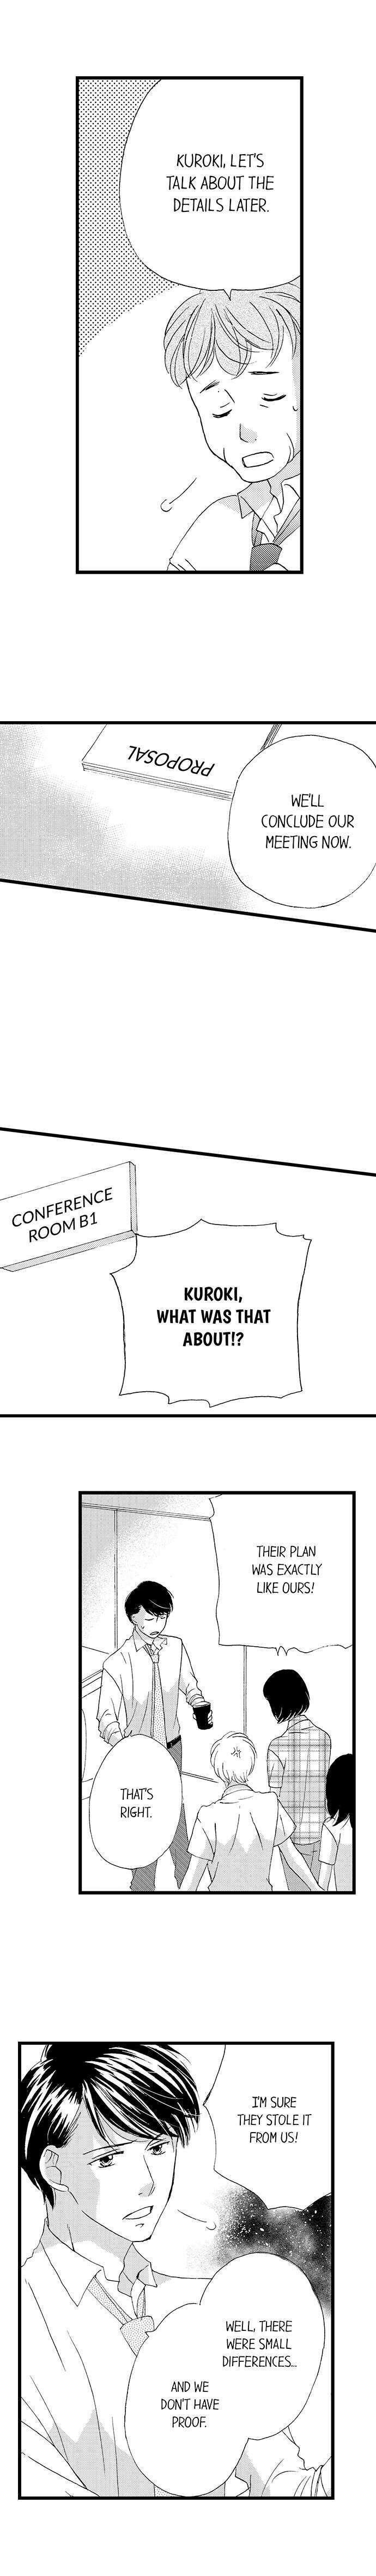 Amaku Nureru Uso Kekkon Toiu Na No Fukushu Chapter 64 page 10 - Mangakakalots.com